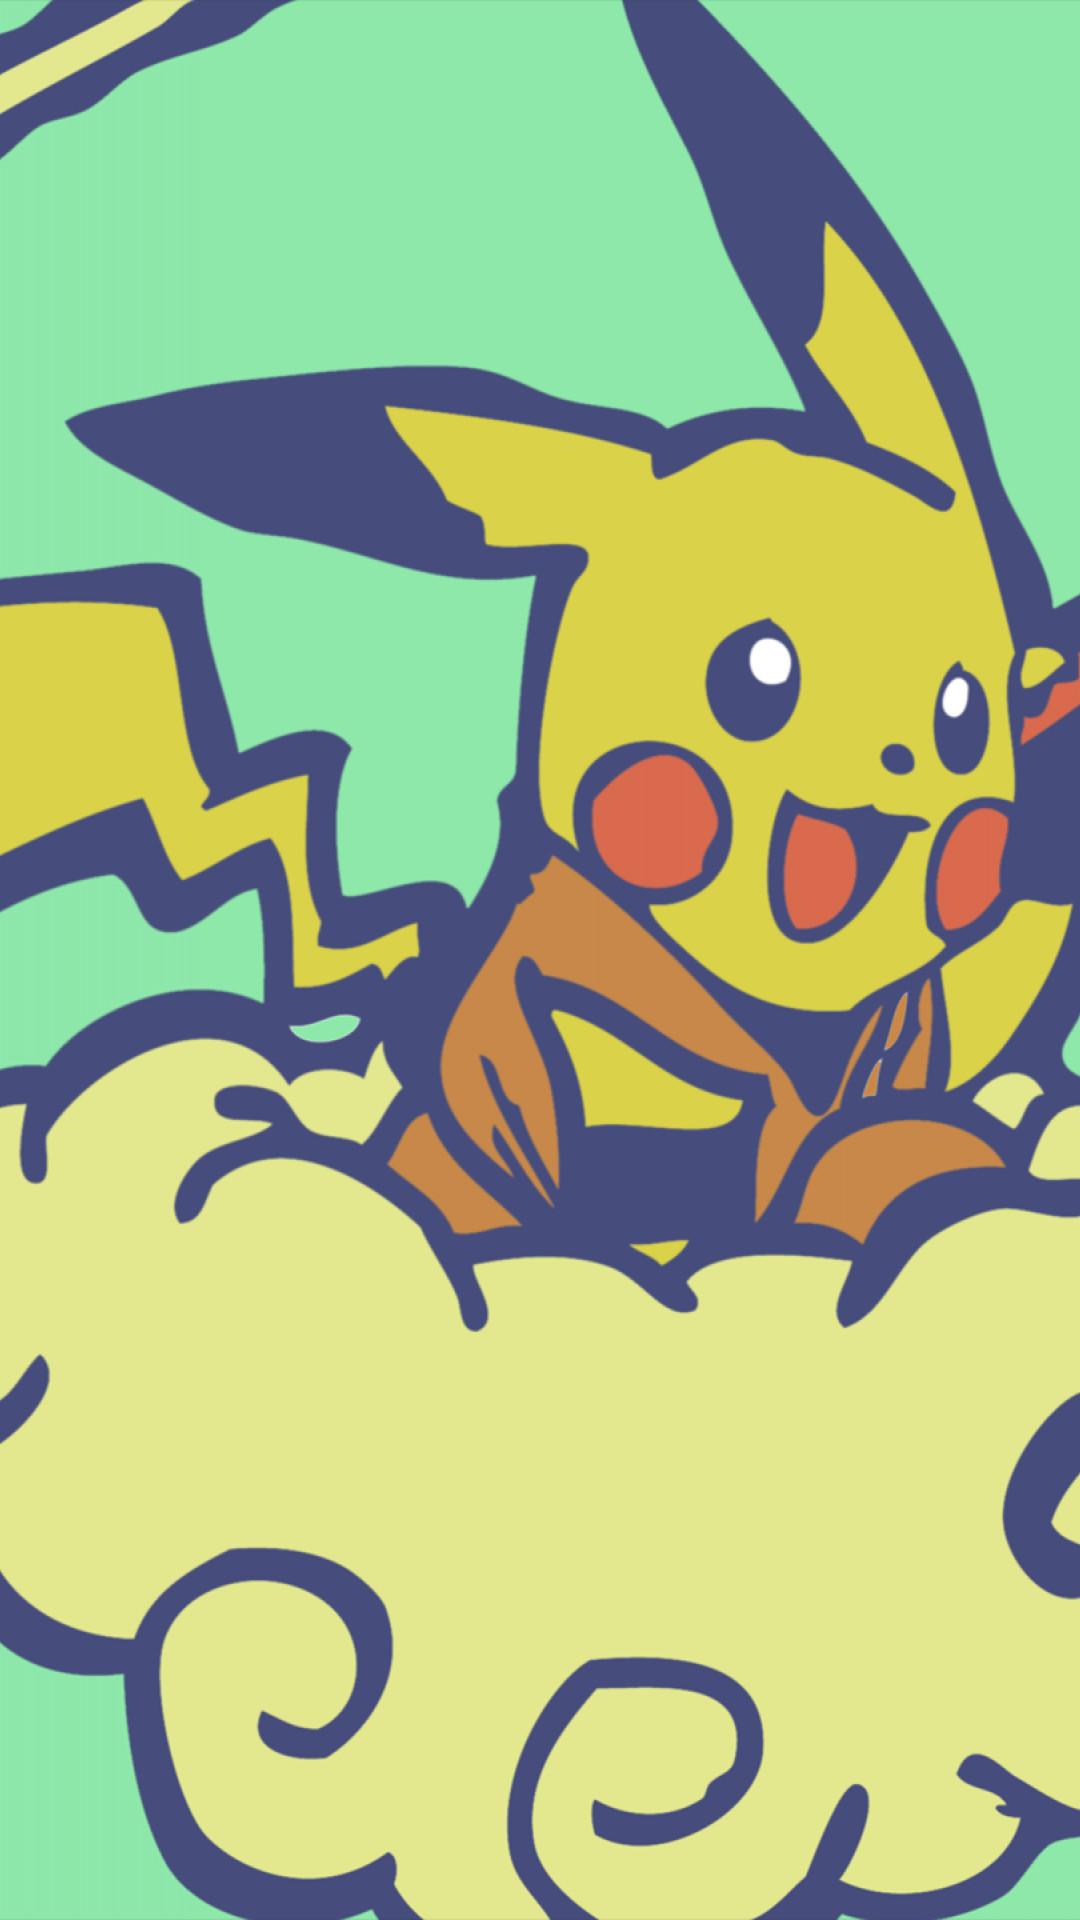 Snorlax Wallpaper Iphone Hd Pokemon Christmas Wallpaper 183 ①